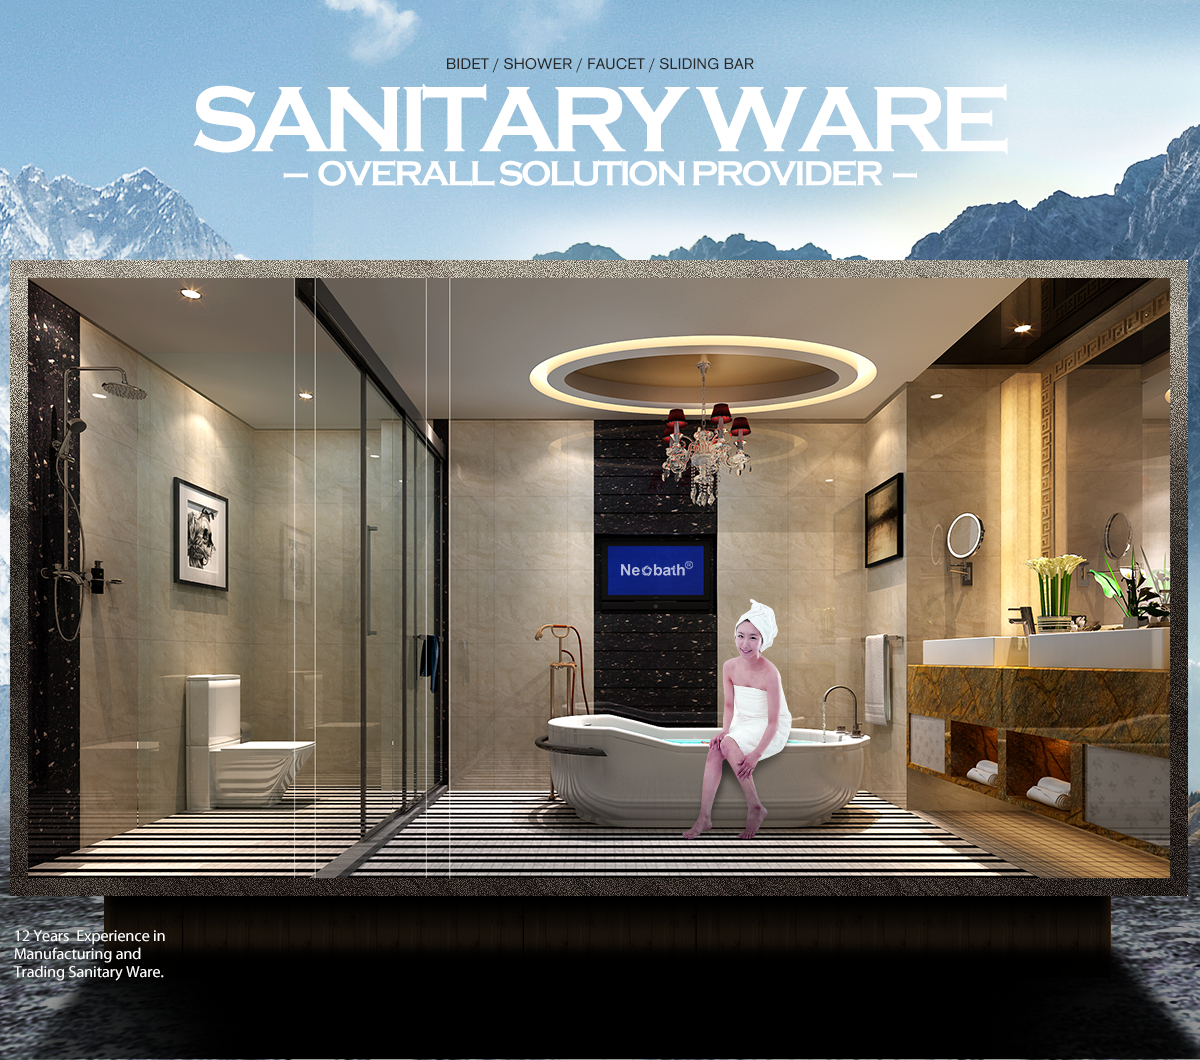 Xiamen Neobath Sanitary Ware Co., Ltd. - BIDET, FAUCET